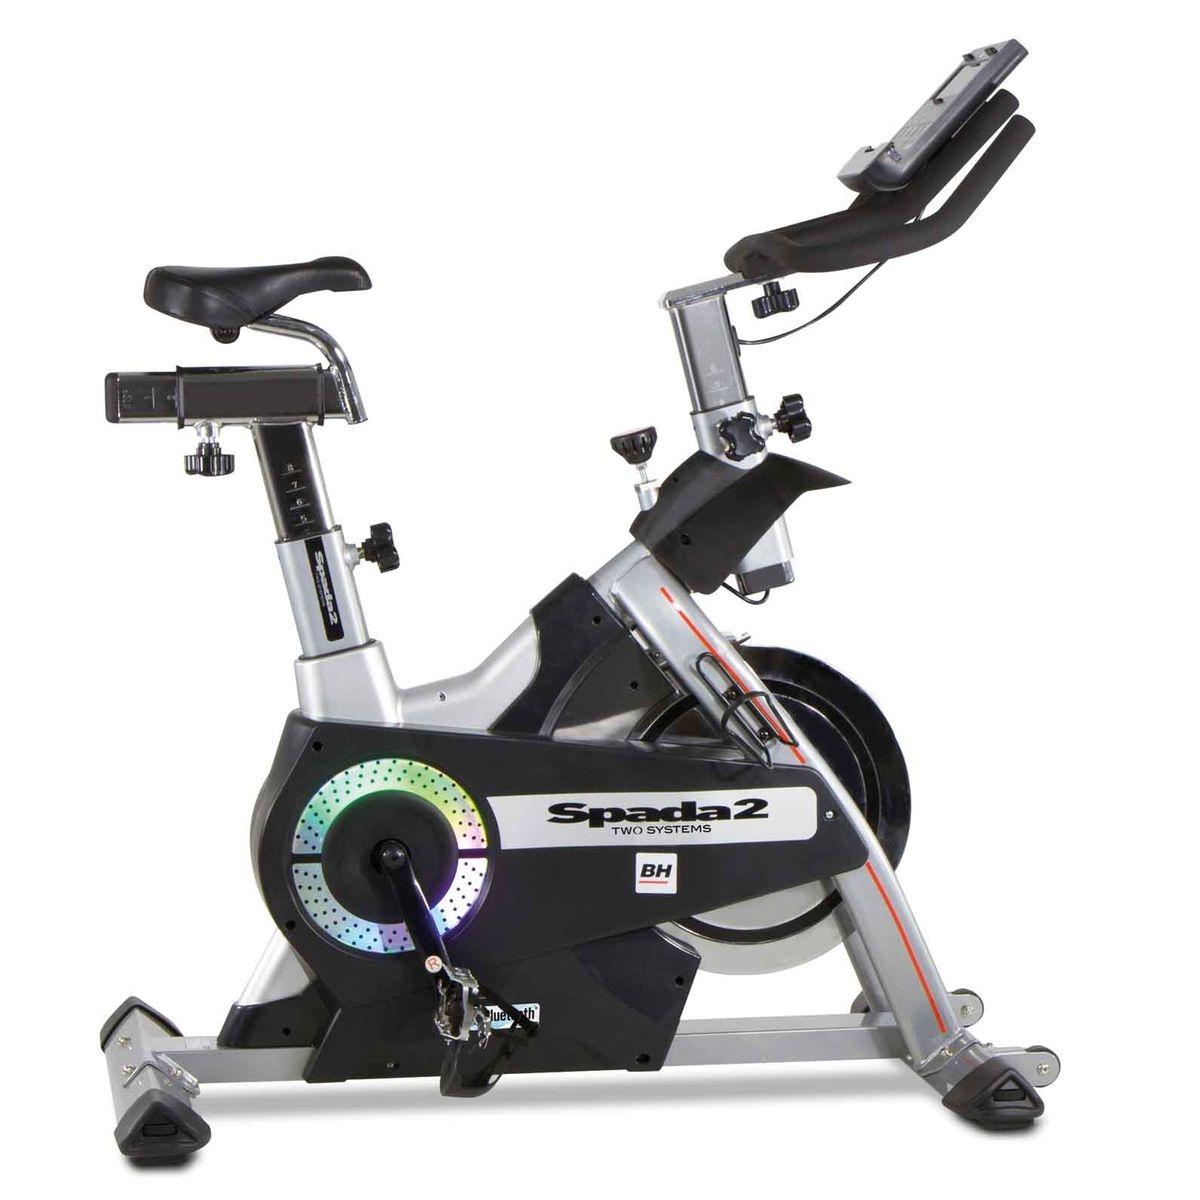 BH Fitness Vélo de biking roue de inertie de 20kg Pédales mixtes - I SPADA II H9355I